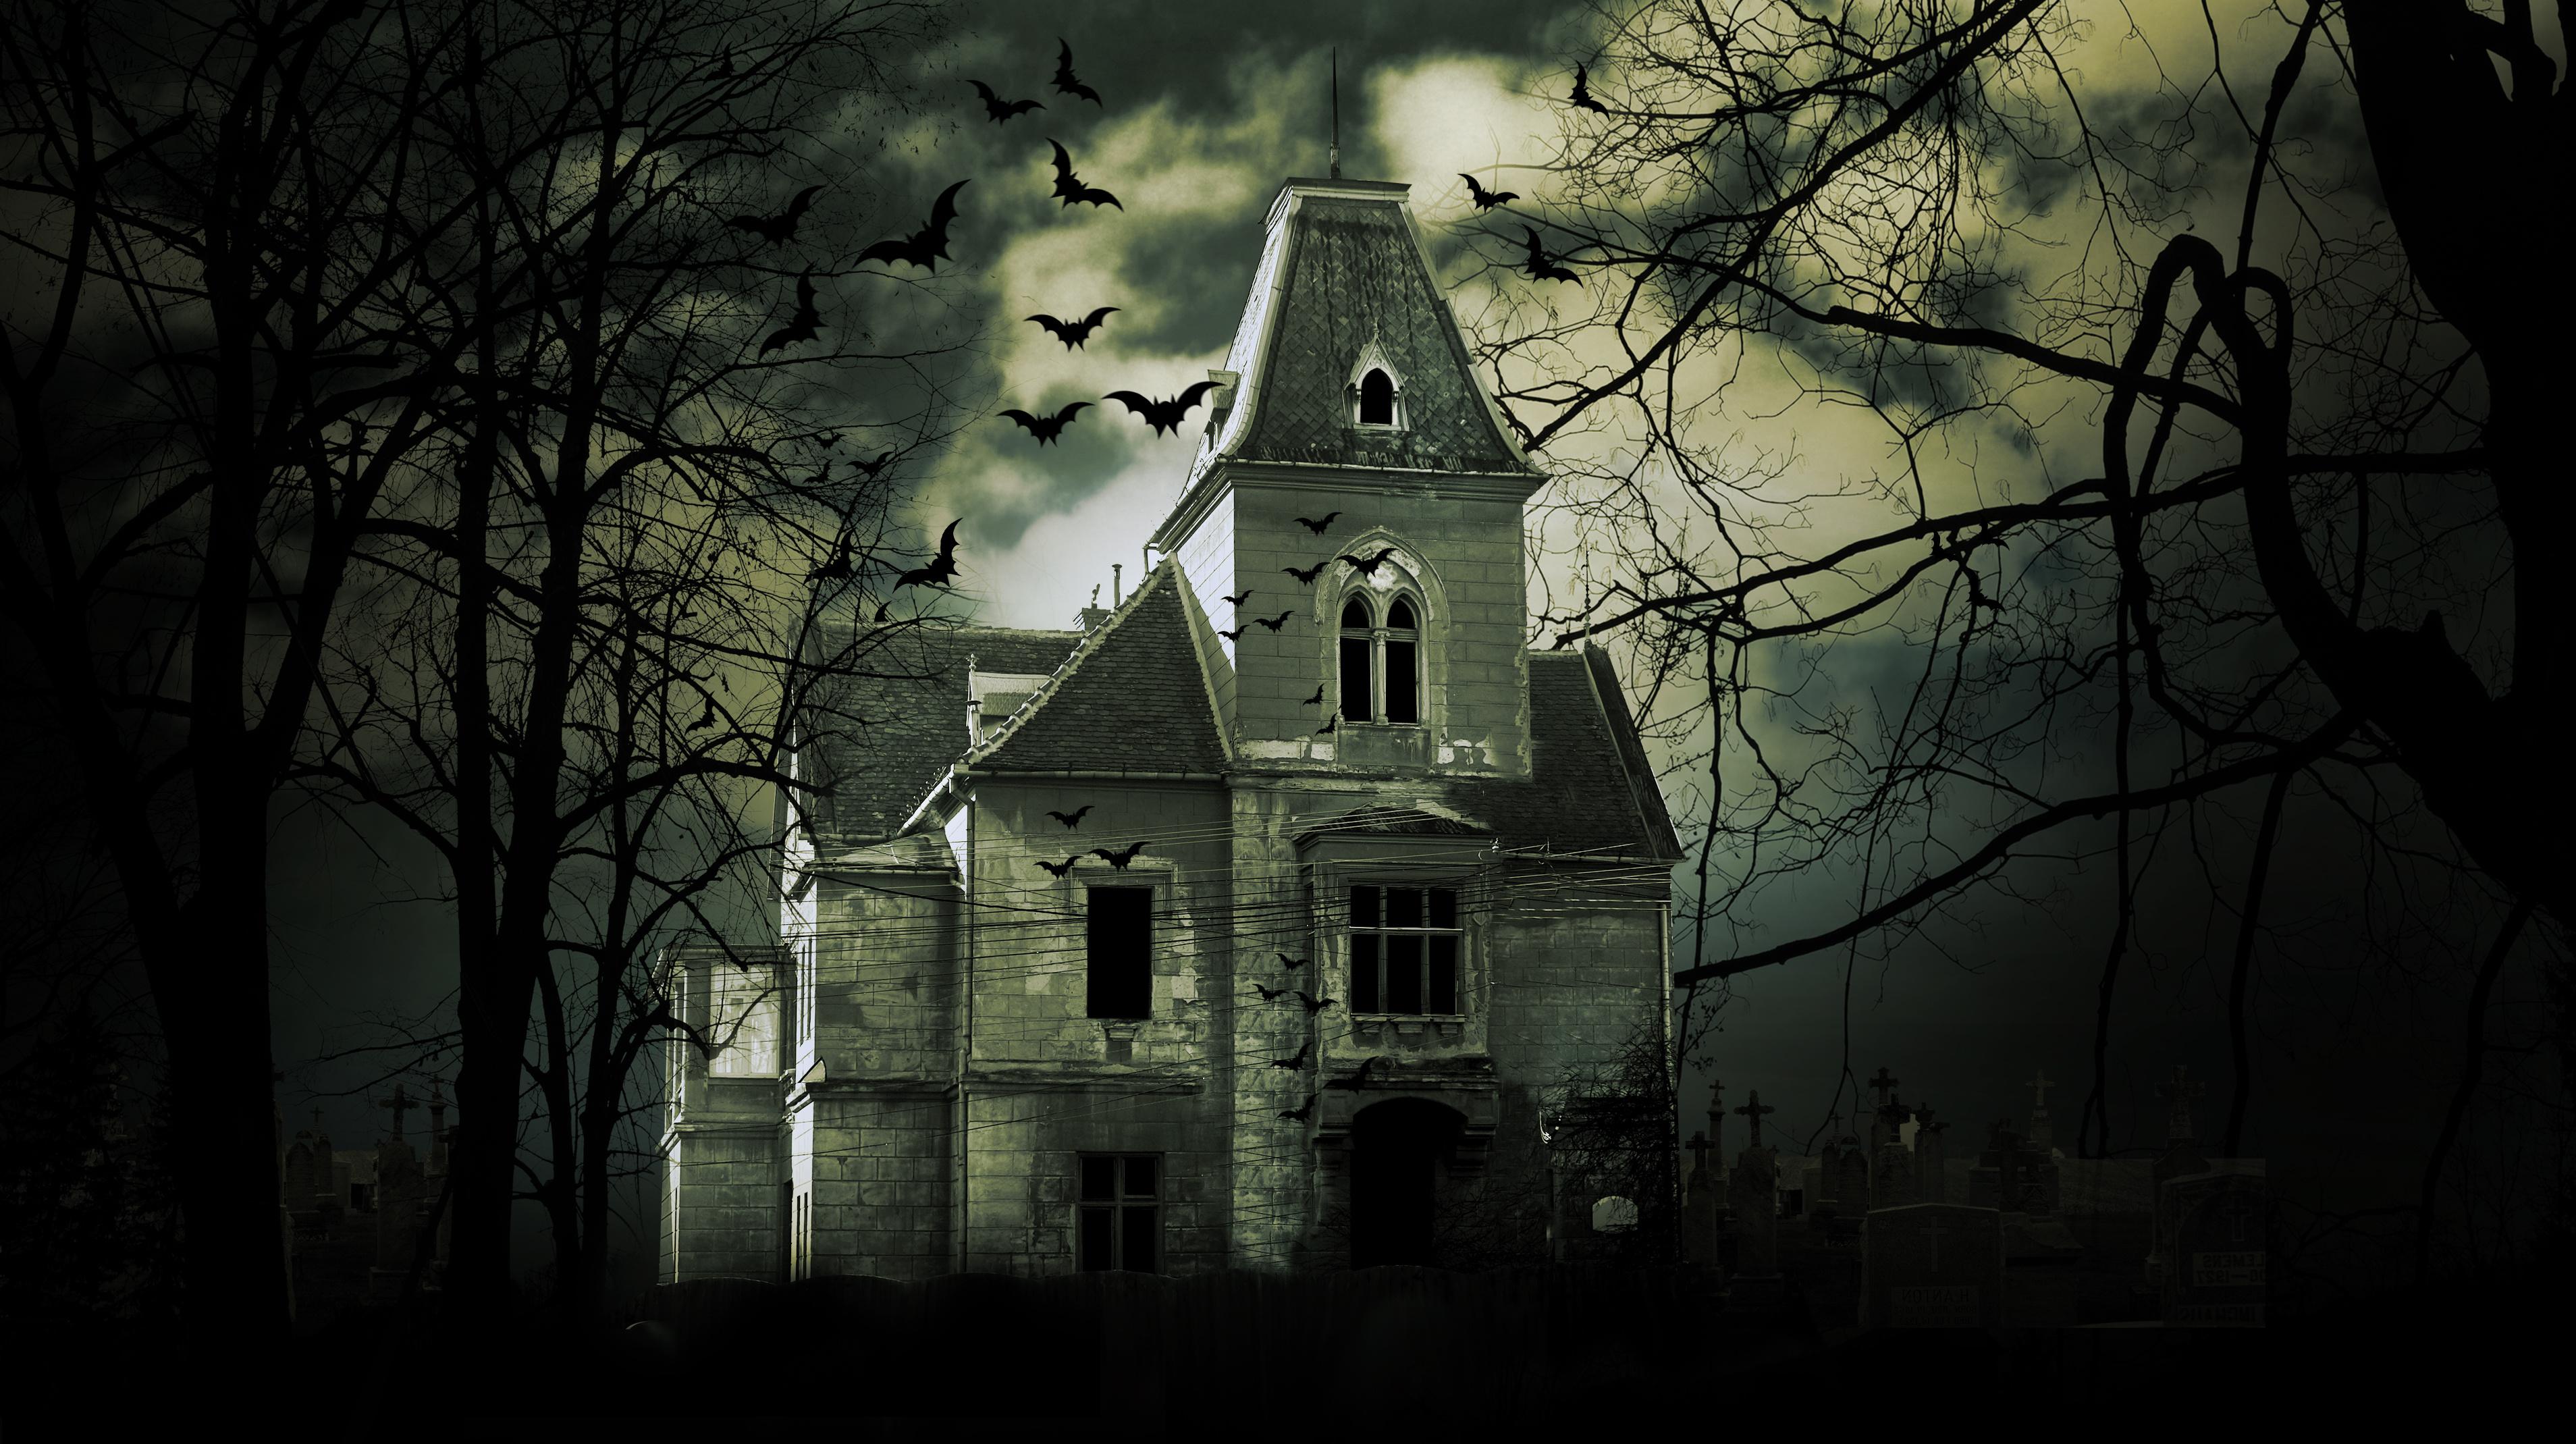 Busch gardens howl o scream liberty ridge - Busch gardens halloween horror nights ...